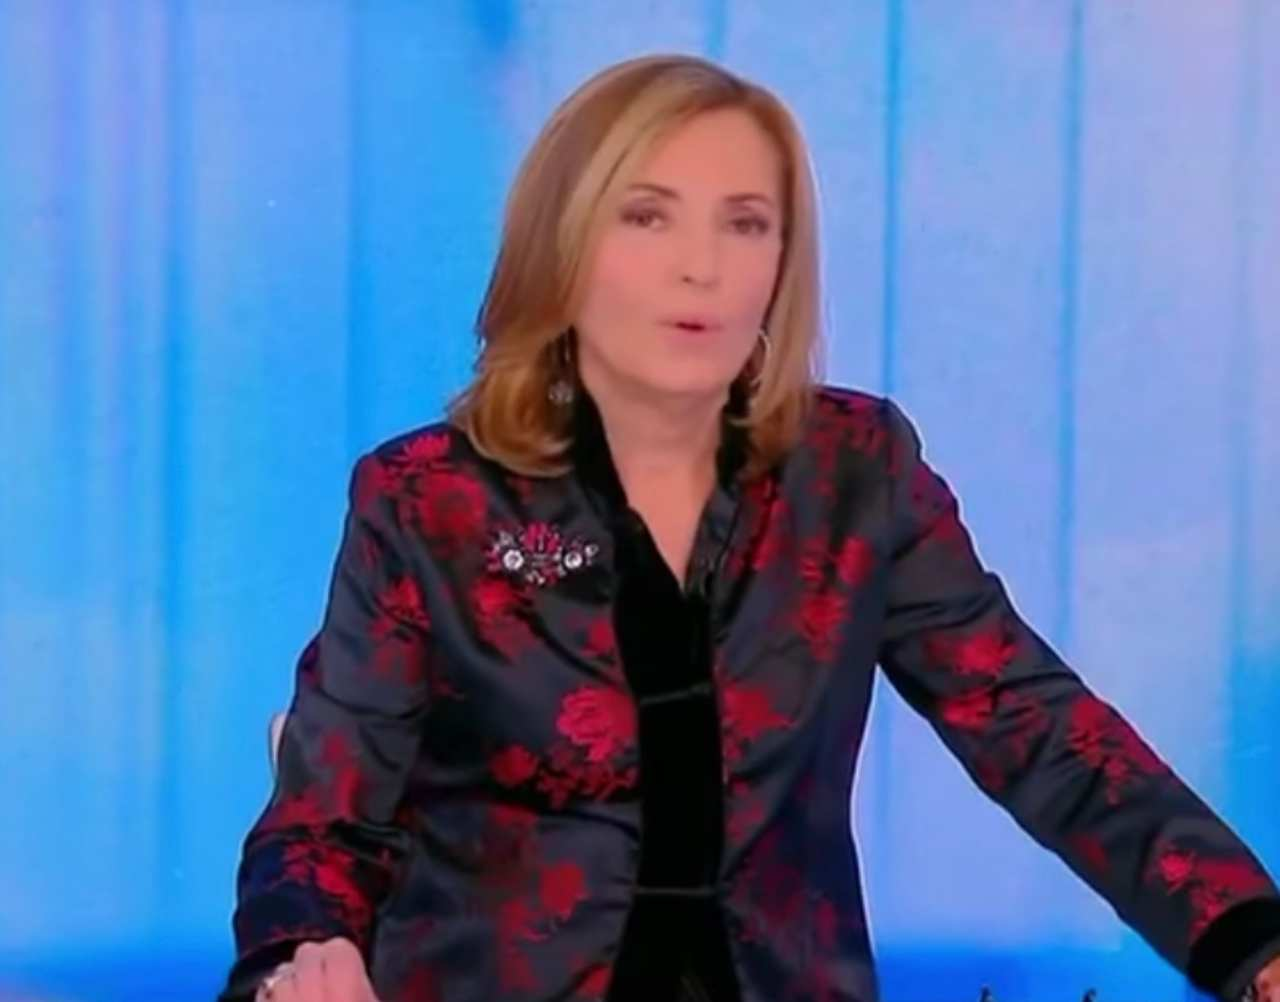 Barbara Palombelli Sorride Alle Parole In Tv Del Marito